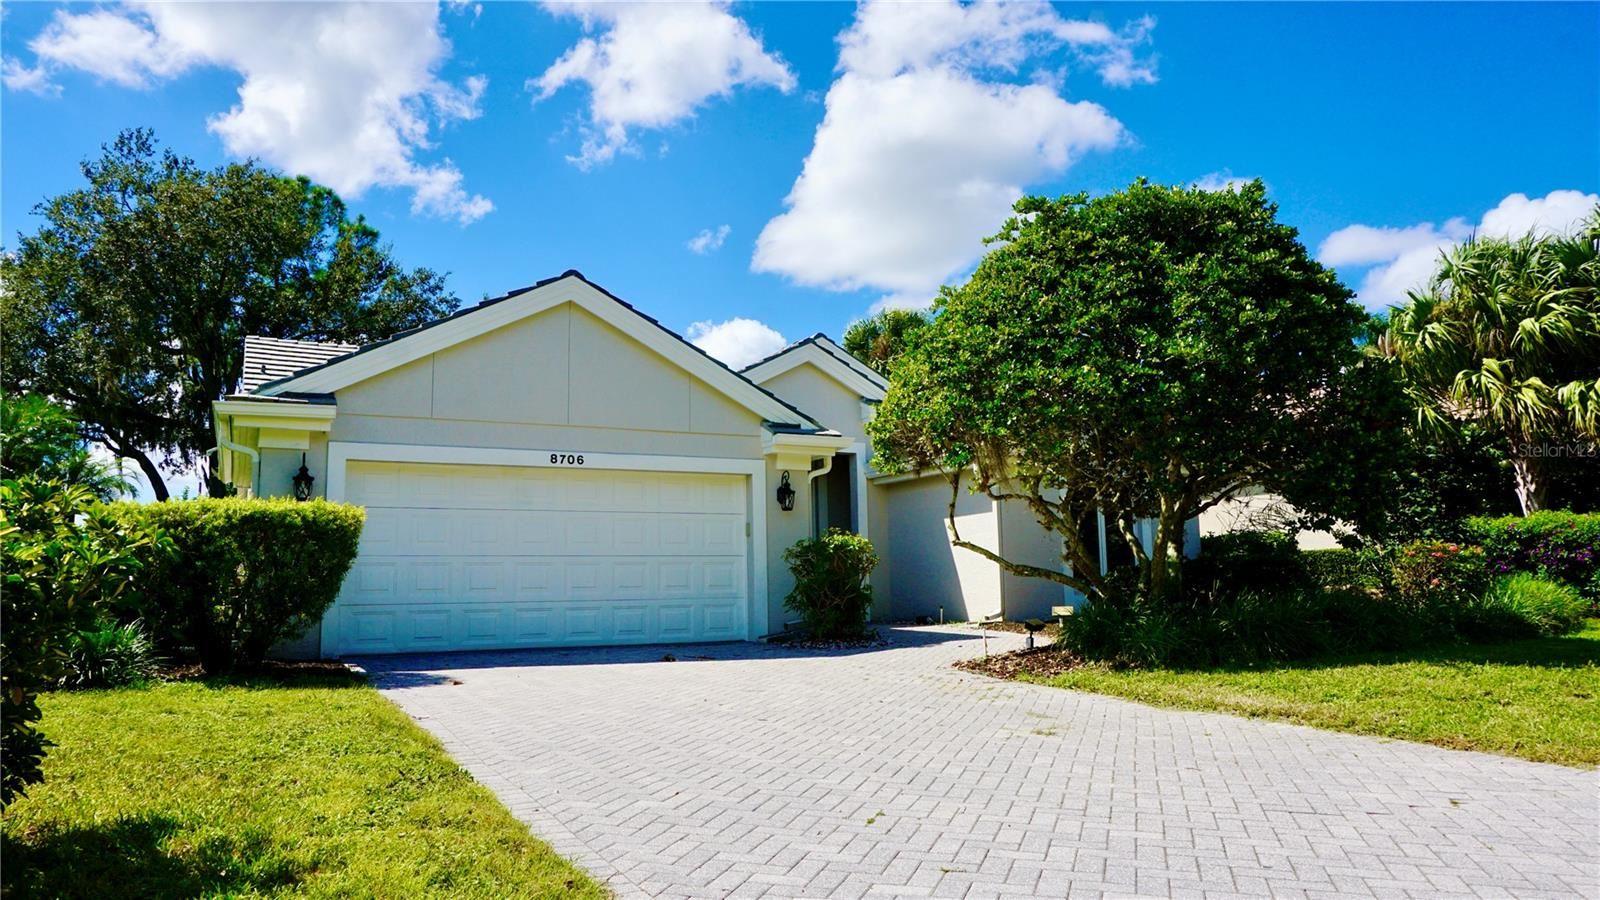 Photo of 8706 54TH AVENUE E, BRADENTON, FL 34211 (MLS # U8137424)